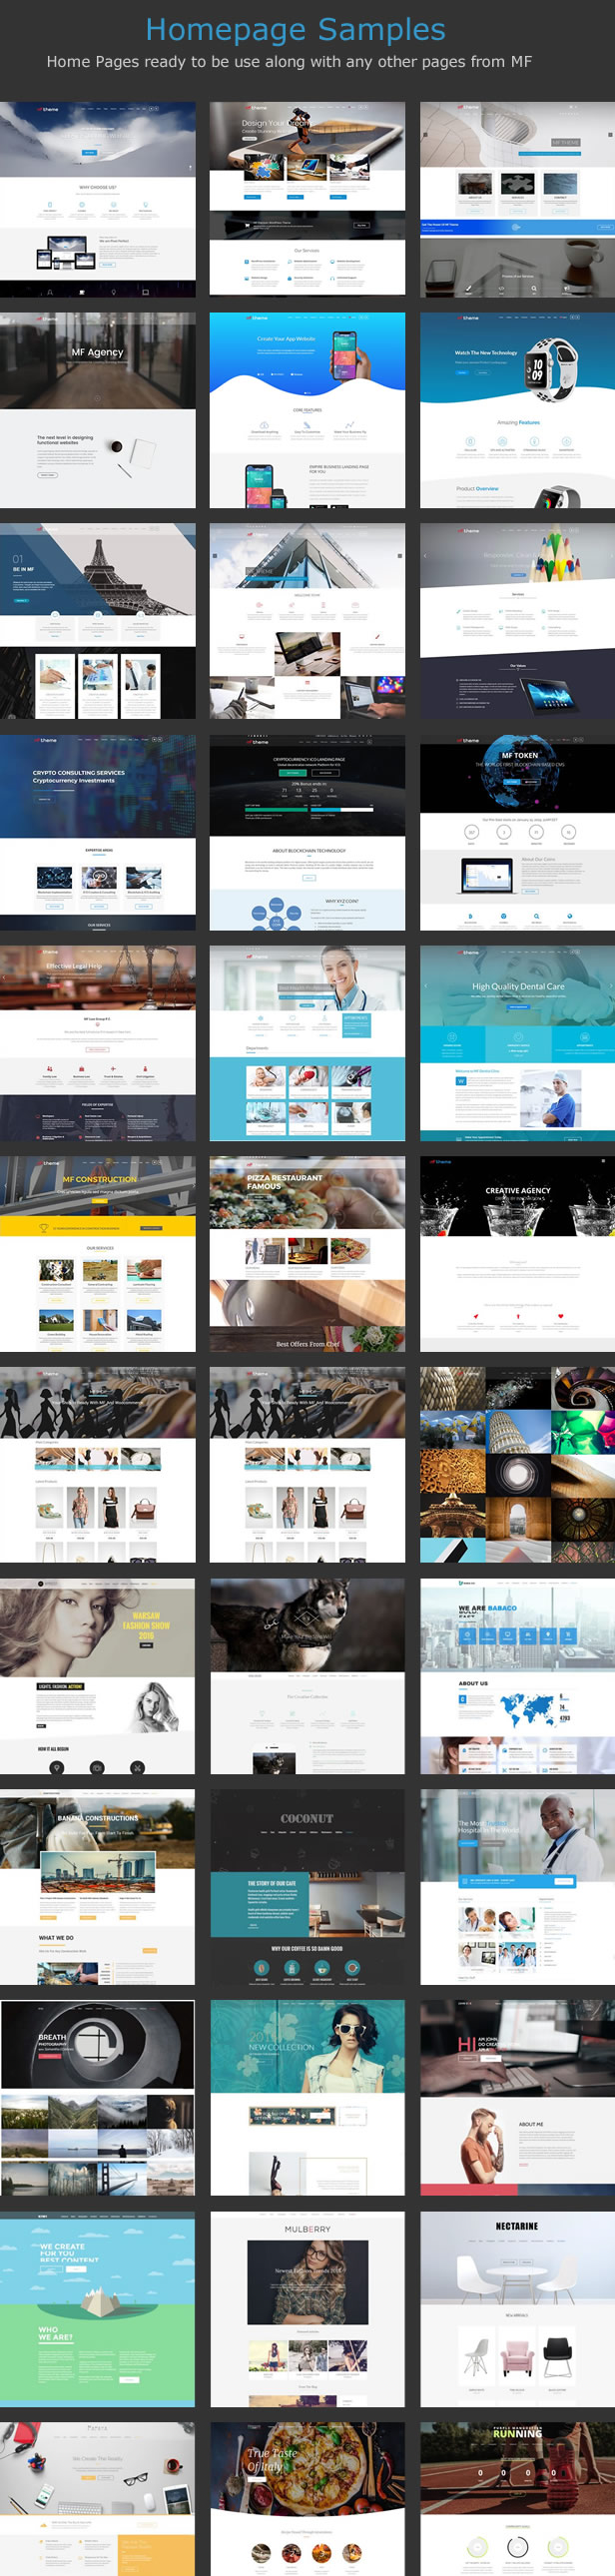 Premium WordPress Themes - Demos